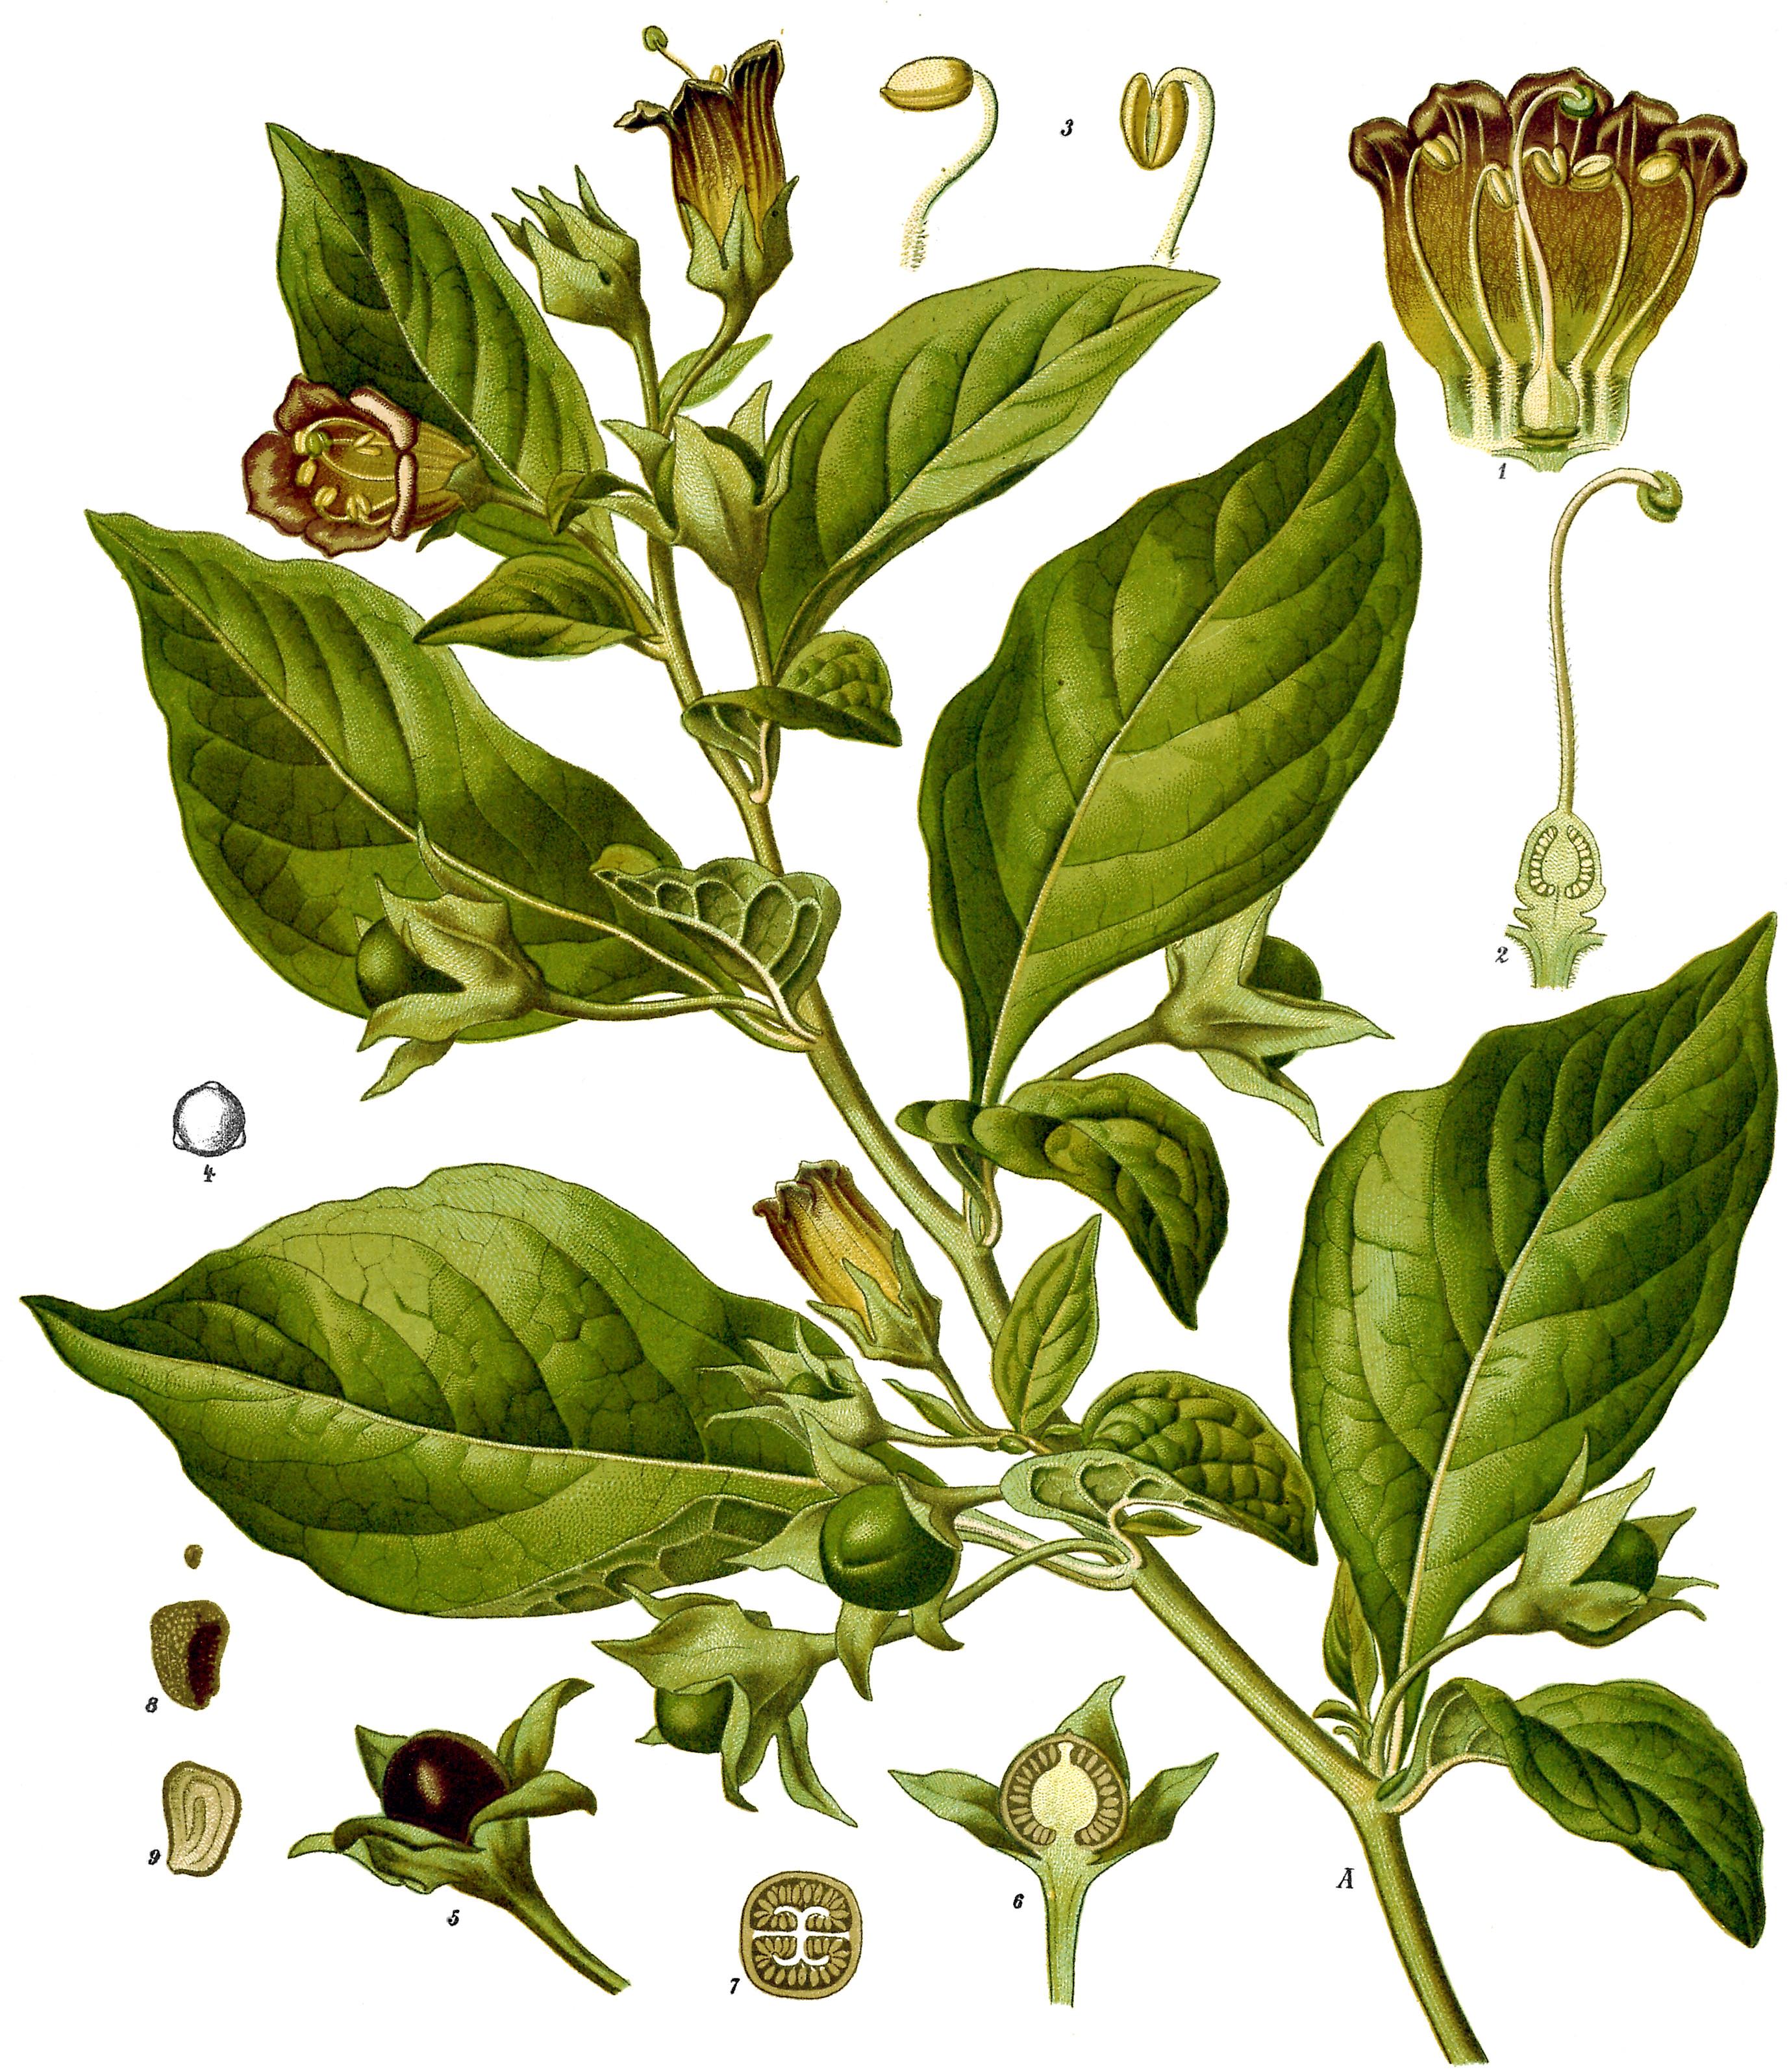 File:Atropa belladonna - Köhler–s Medizinal-Pflanzen-018.jpg